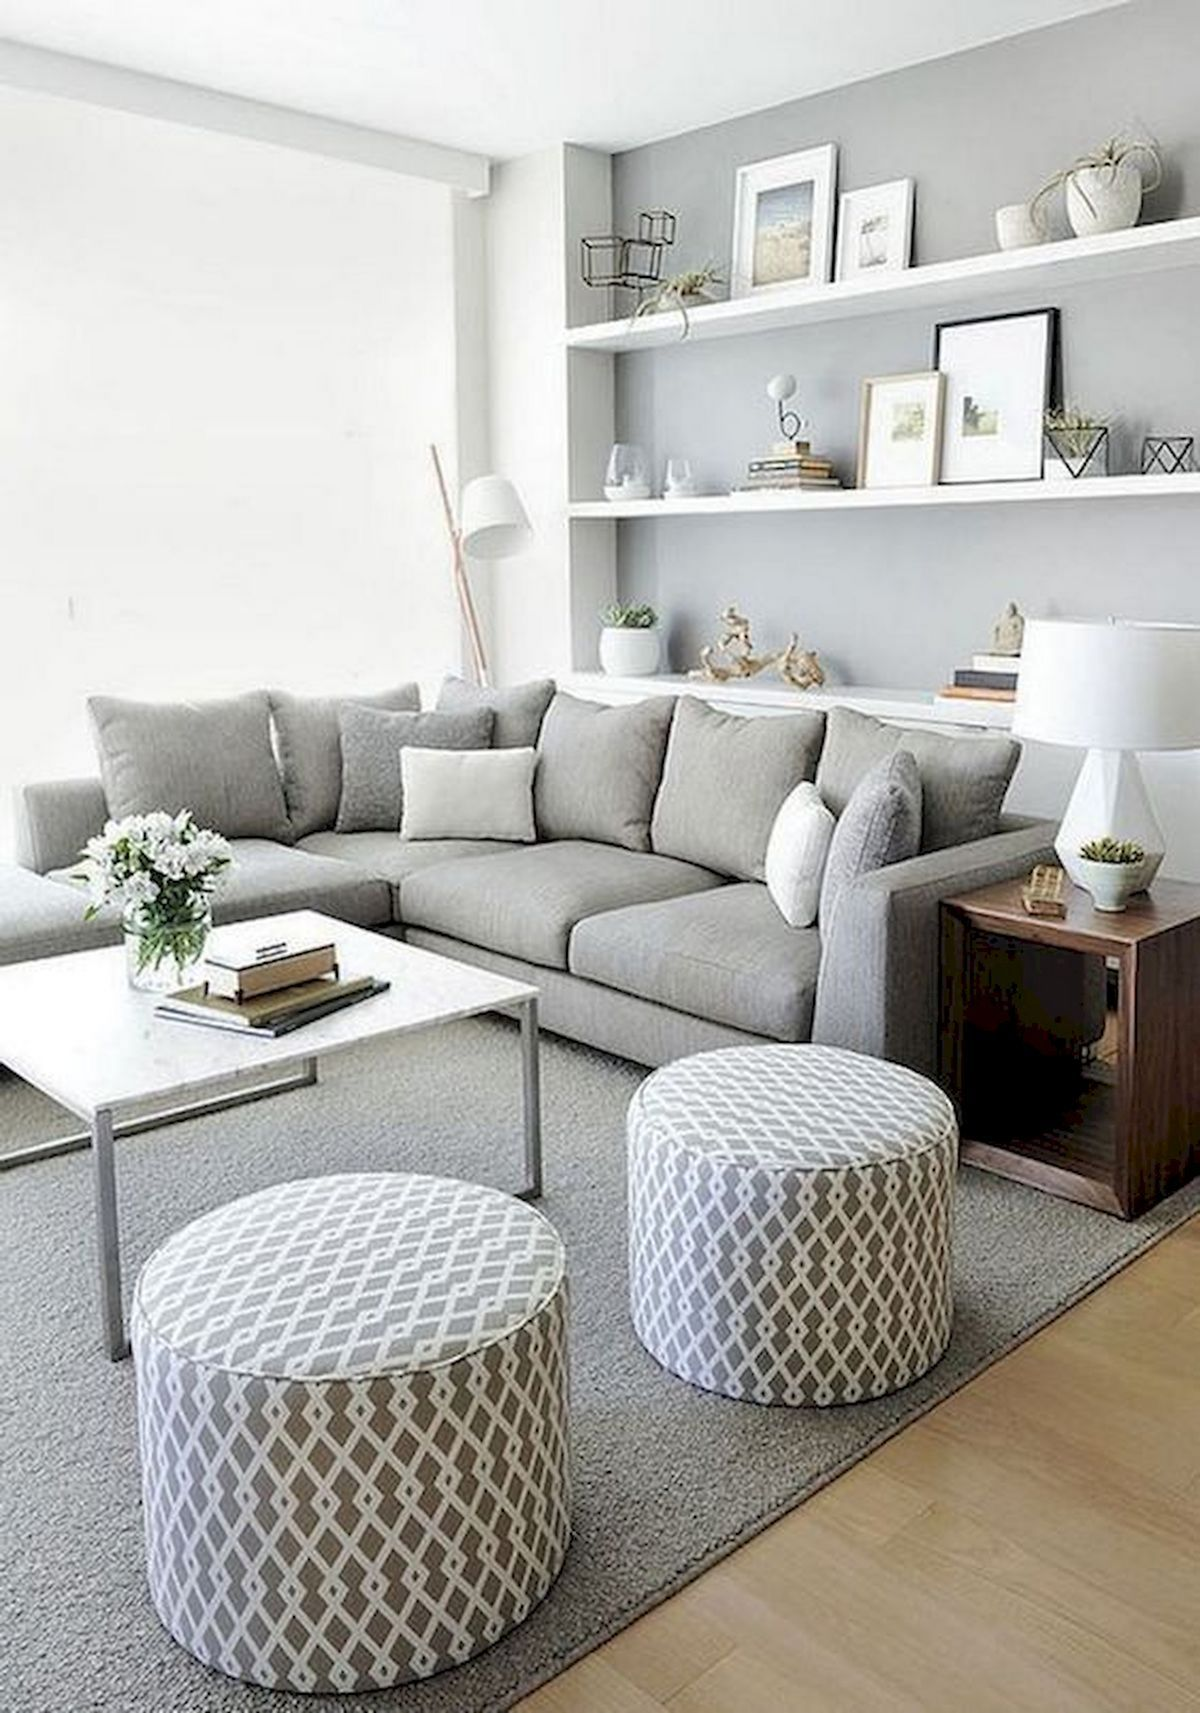 interior design of simple house Home Design Download Interior Design Of Simple House Pics